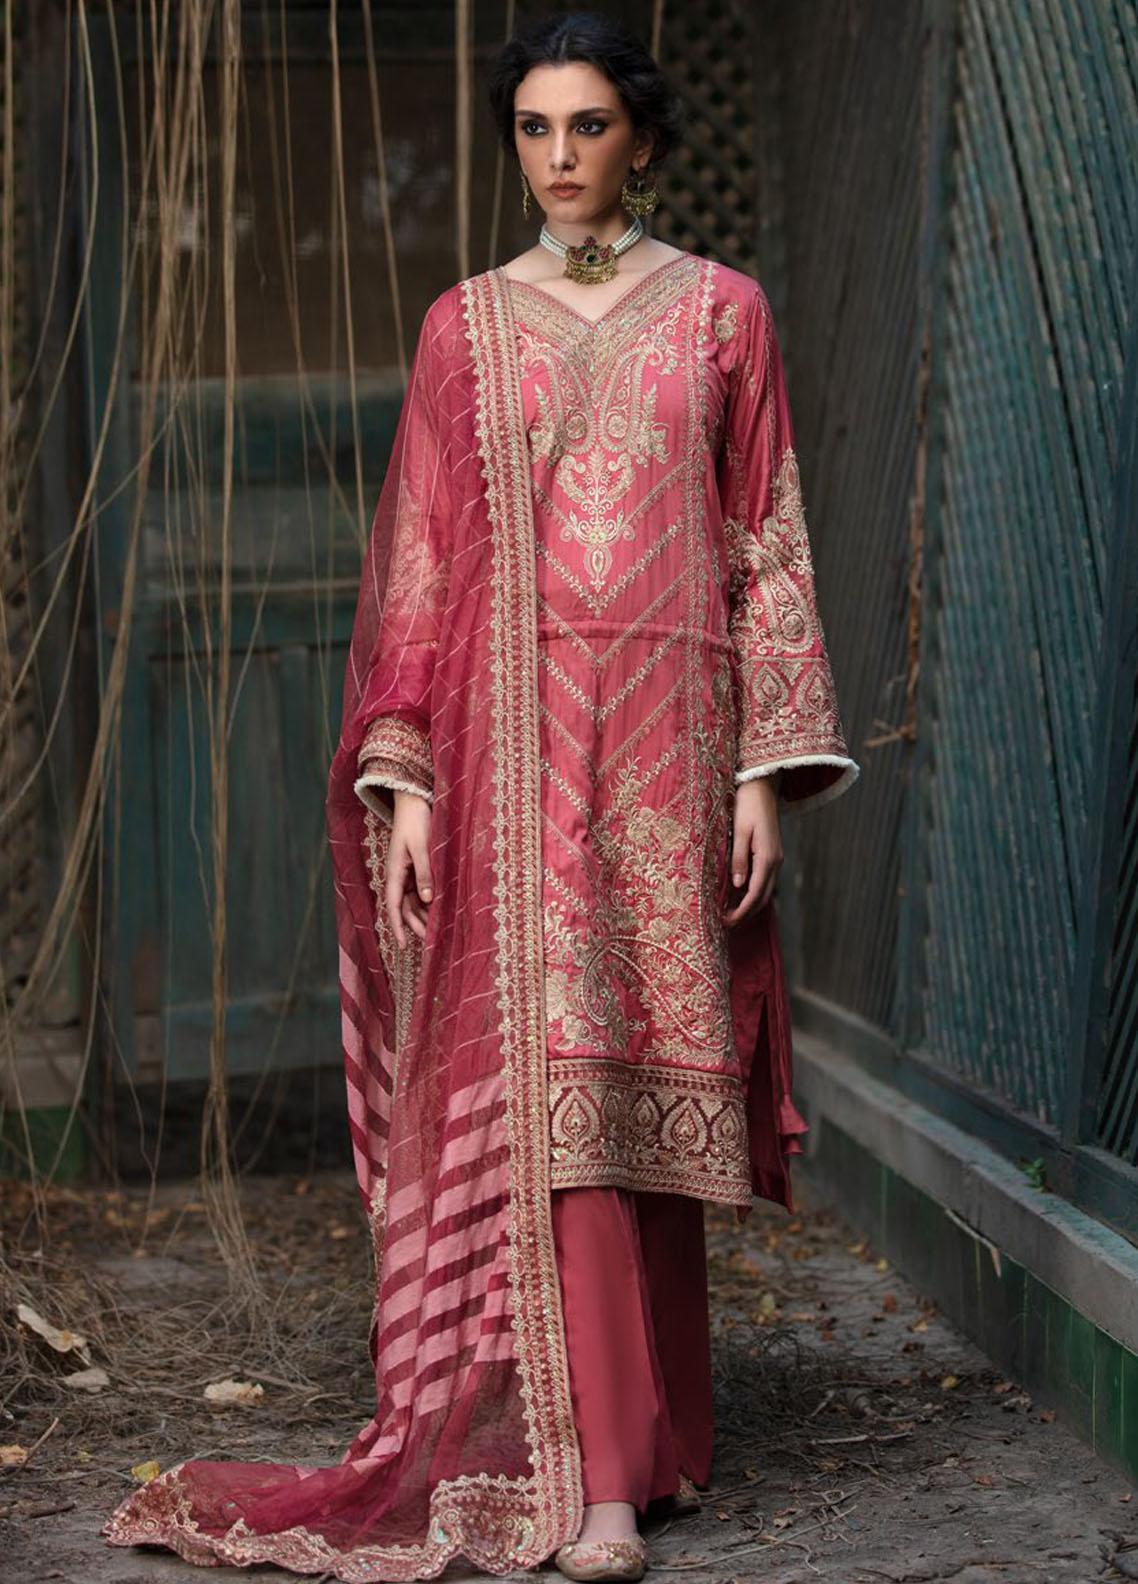 Wasiyat by Motifz Embroidered Cotton Satin Suits Unstitched 3 Piece MT21W MWUA-3024 ZAHRI-B - Winter Collection